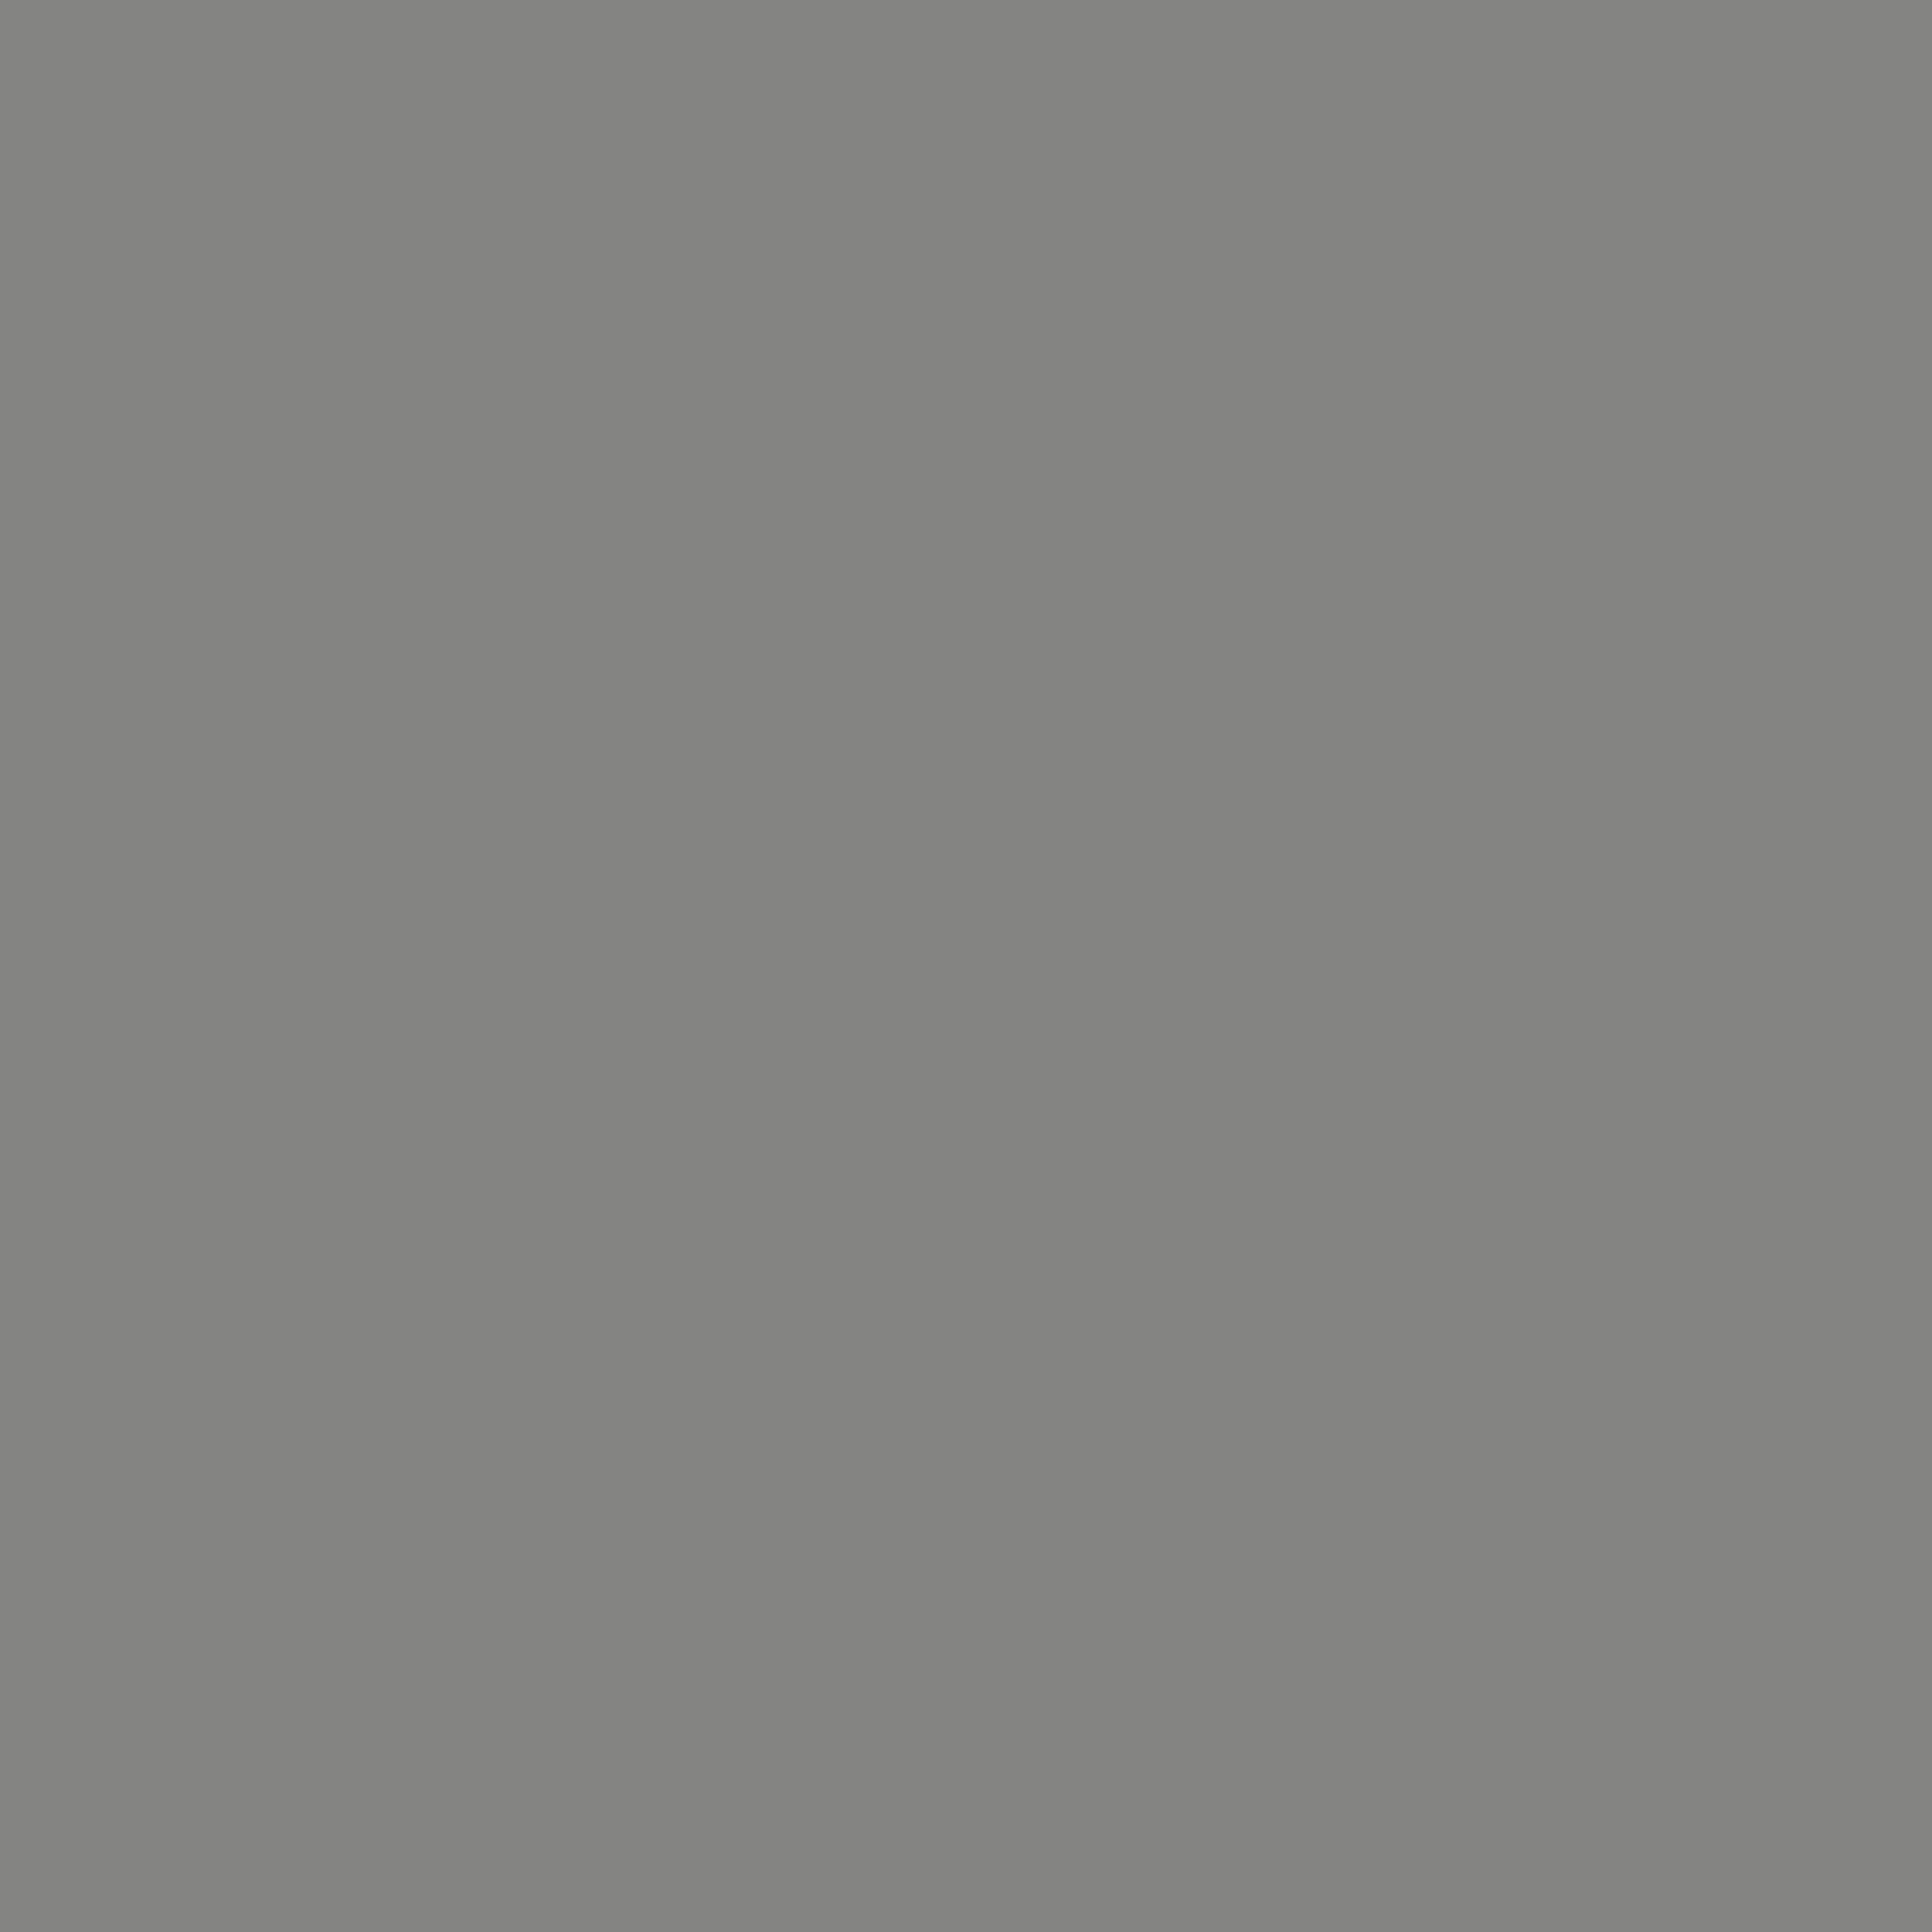 2732x2732 Battleship Grey Solid Color Background